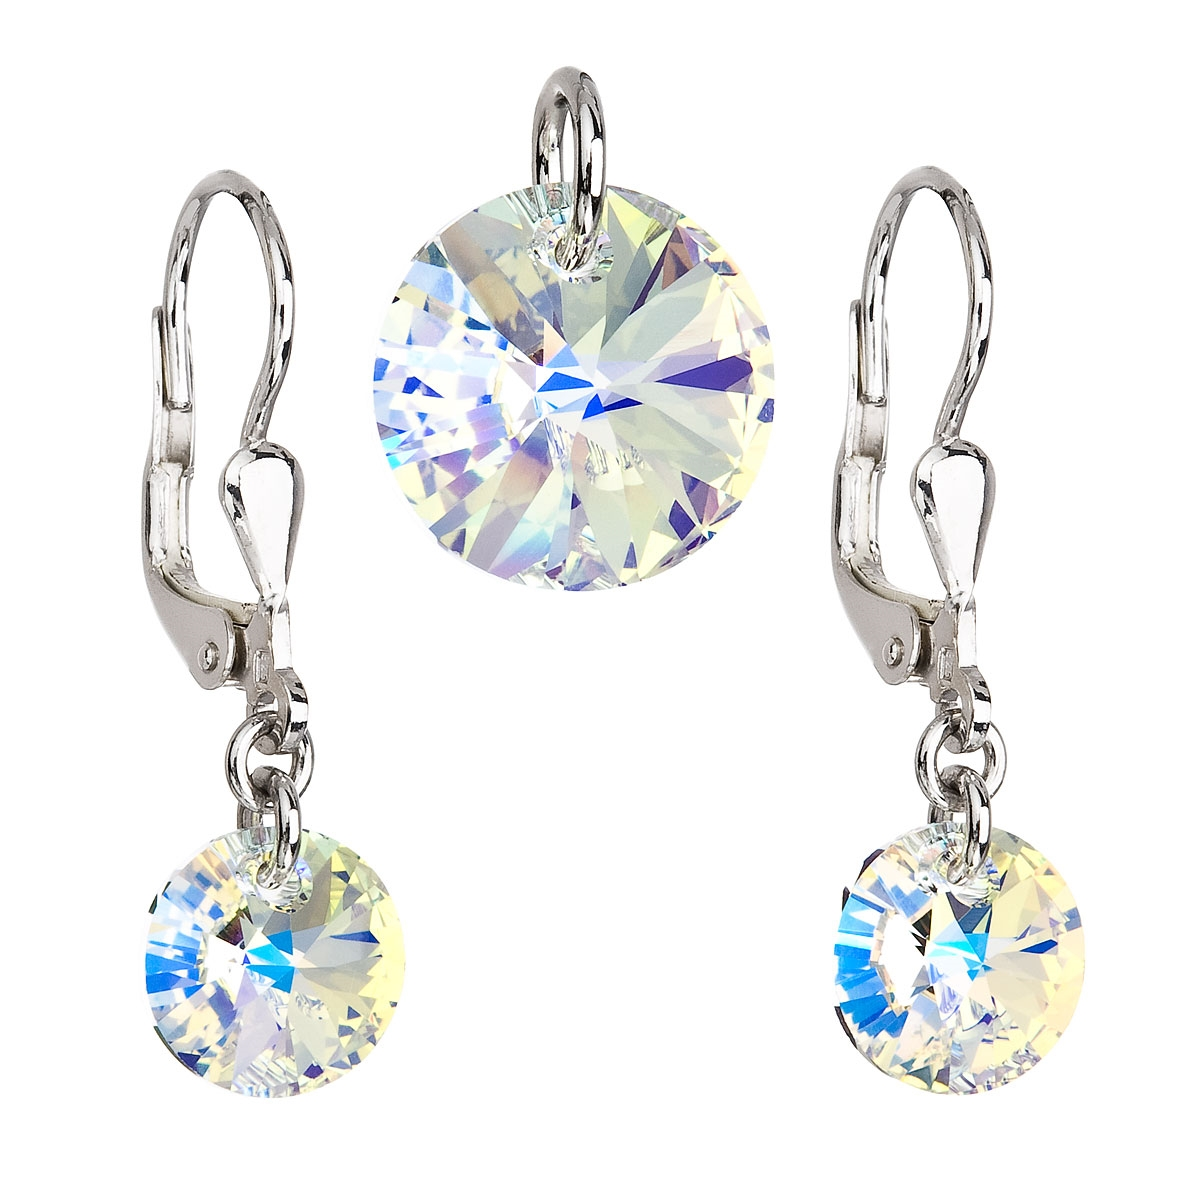 Sada šperků s kamínky Crystals from Swarovski® AB EG3035-AB